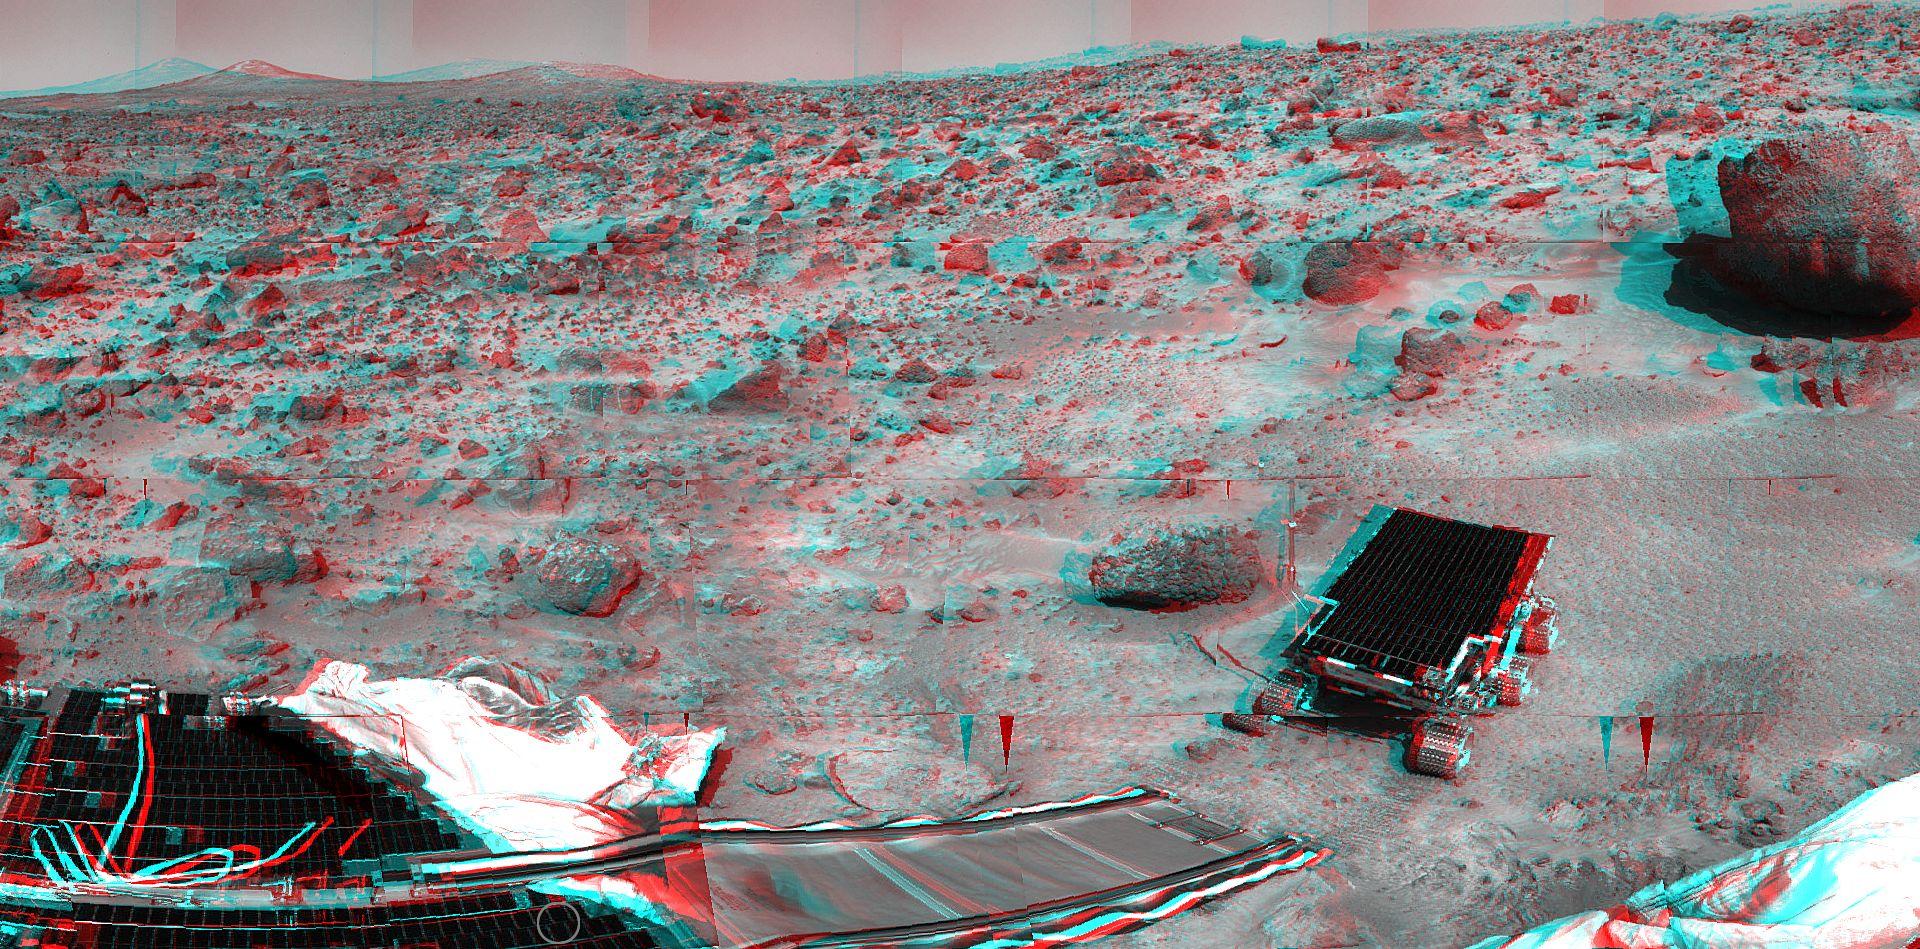 Pathfinder - Sojourner - Mars - Panorama - Anaglyphe - 3D - stéréo - NASA